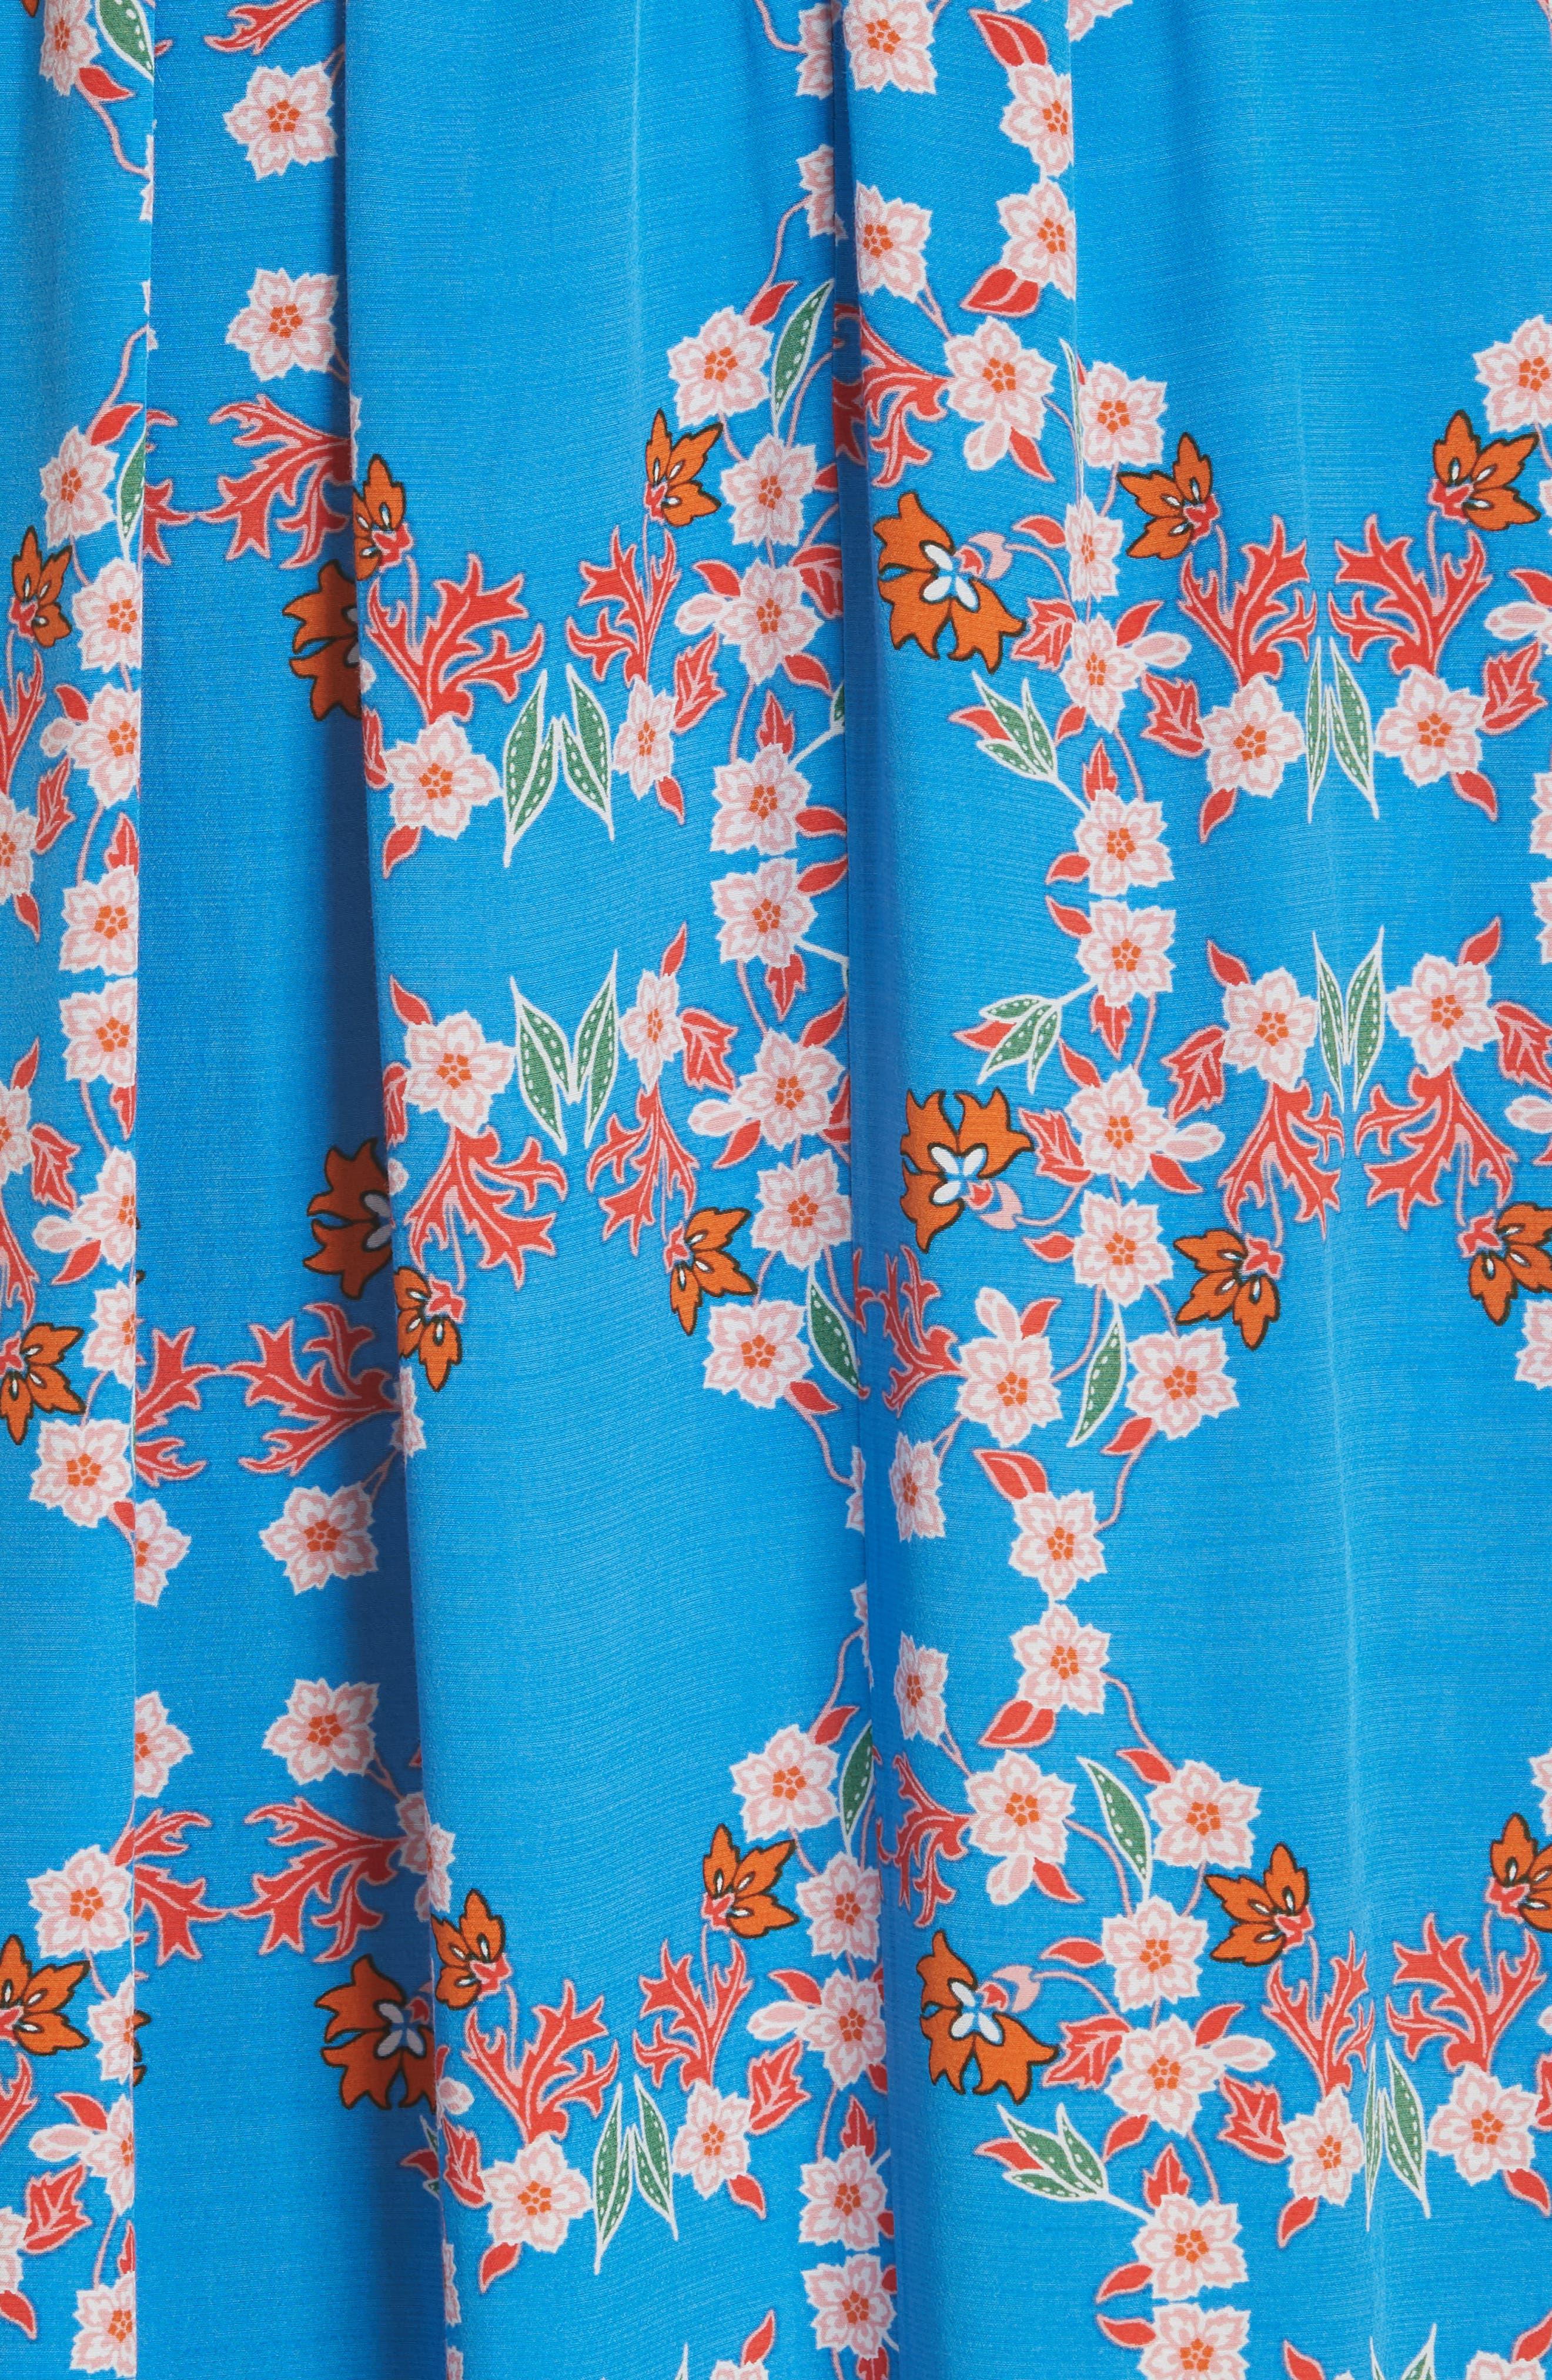 Floral Plunging Slit Dress,                             Alternate thumbnail 6, color,                             400